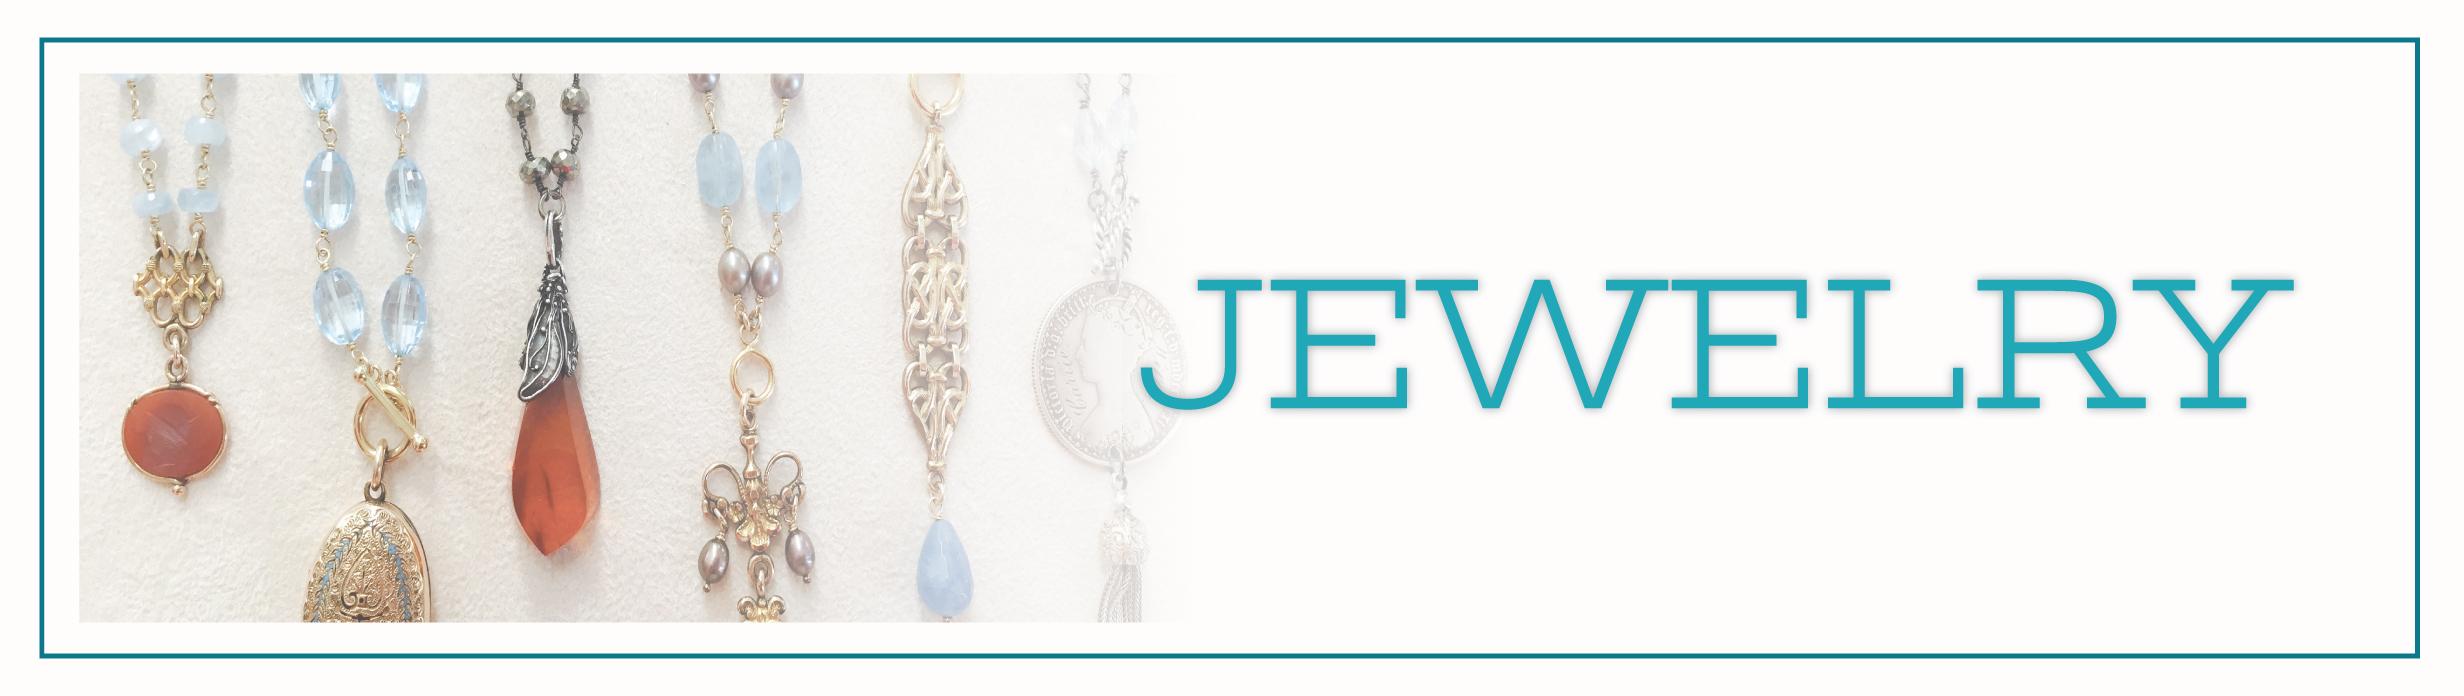 Jewelry-Button-Horizontal.jpg